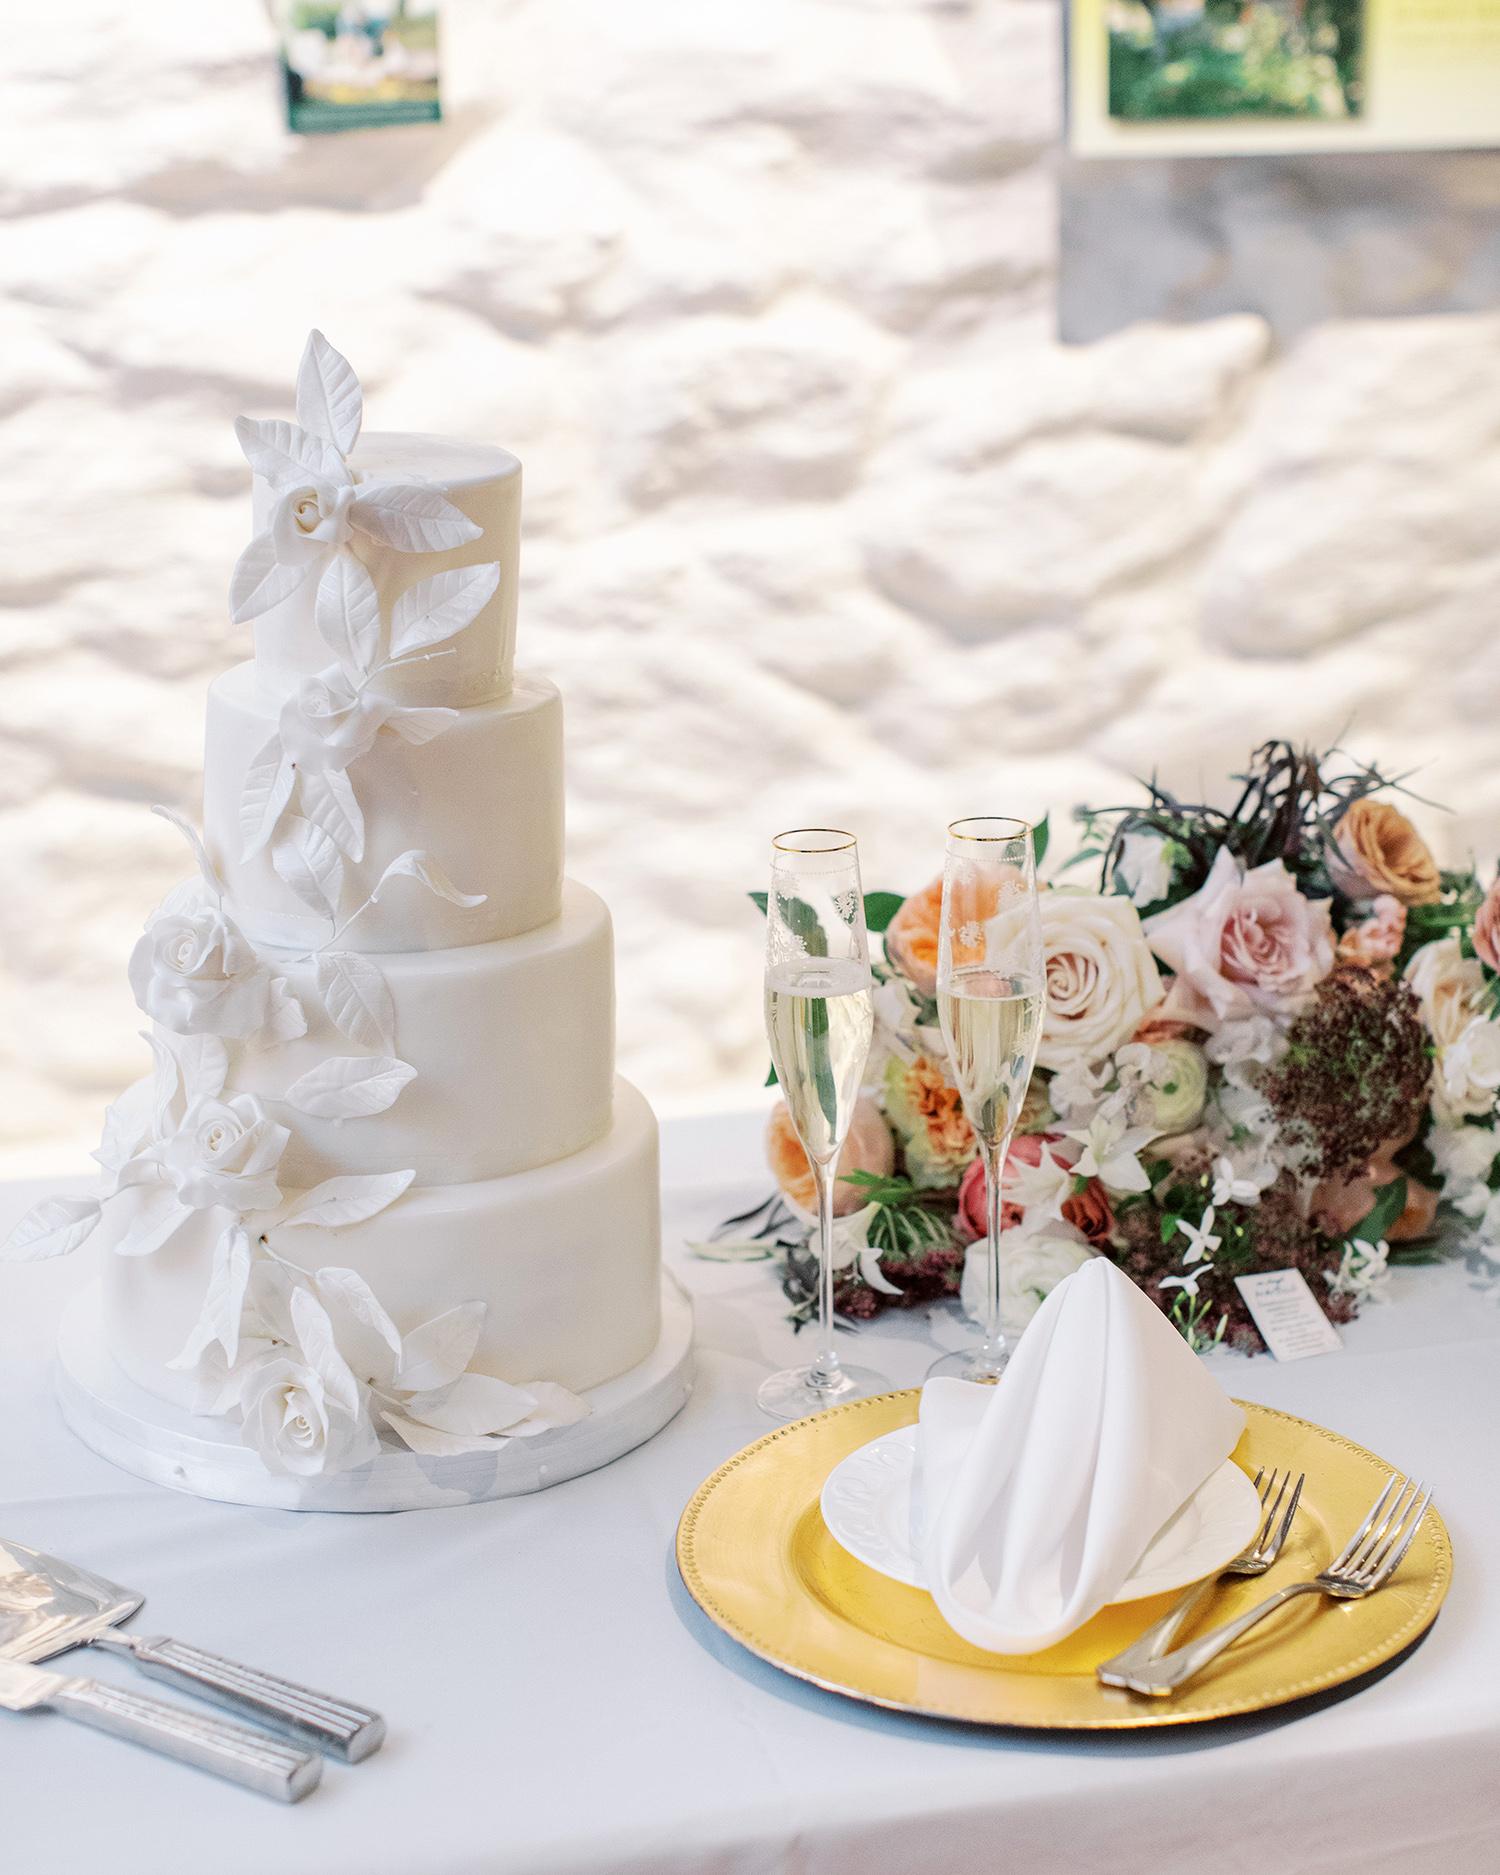 noel mike wedding white cake